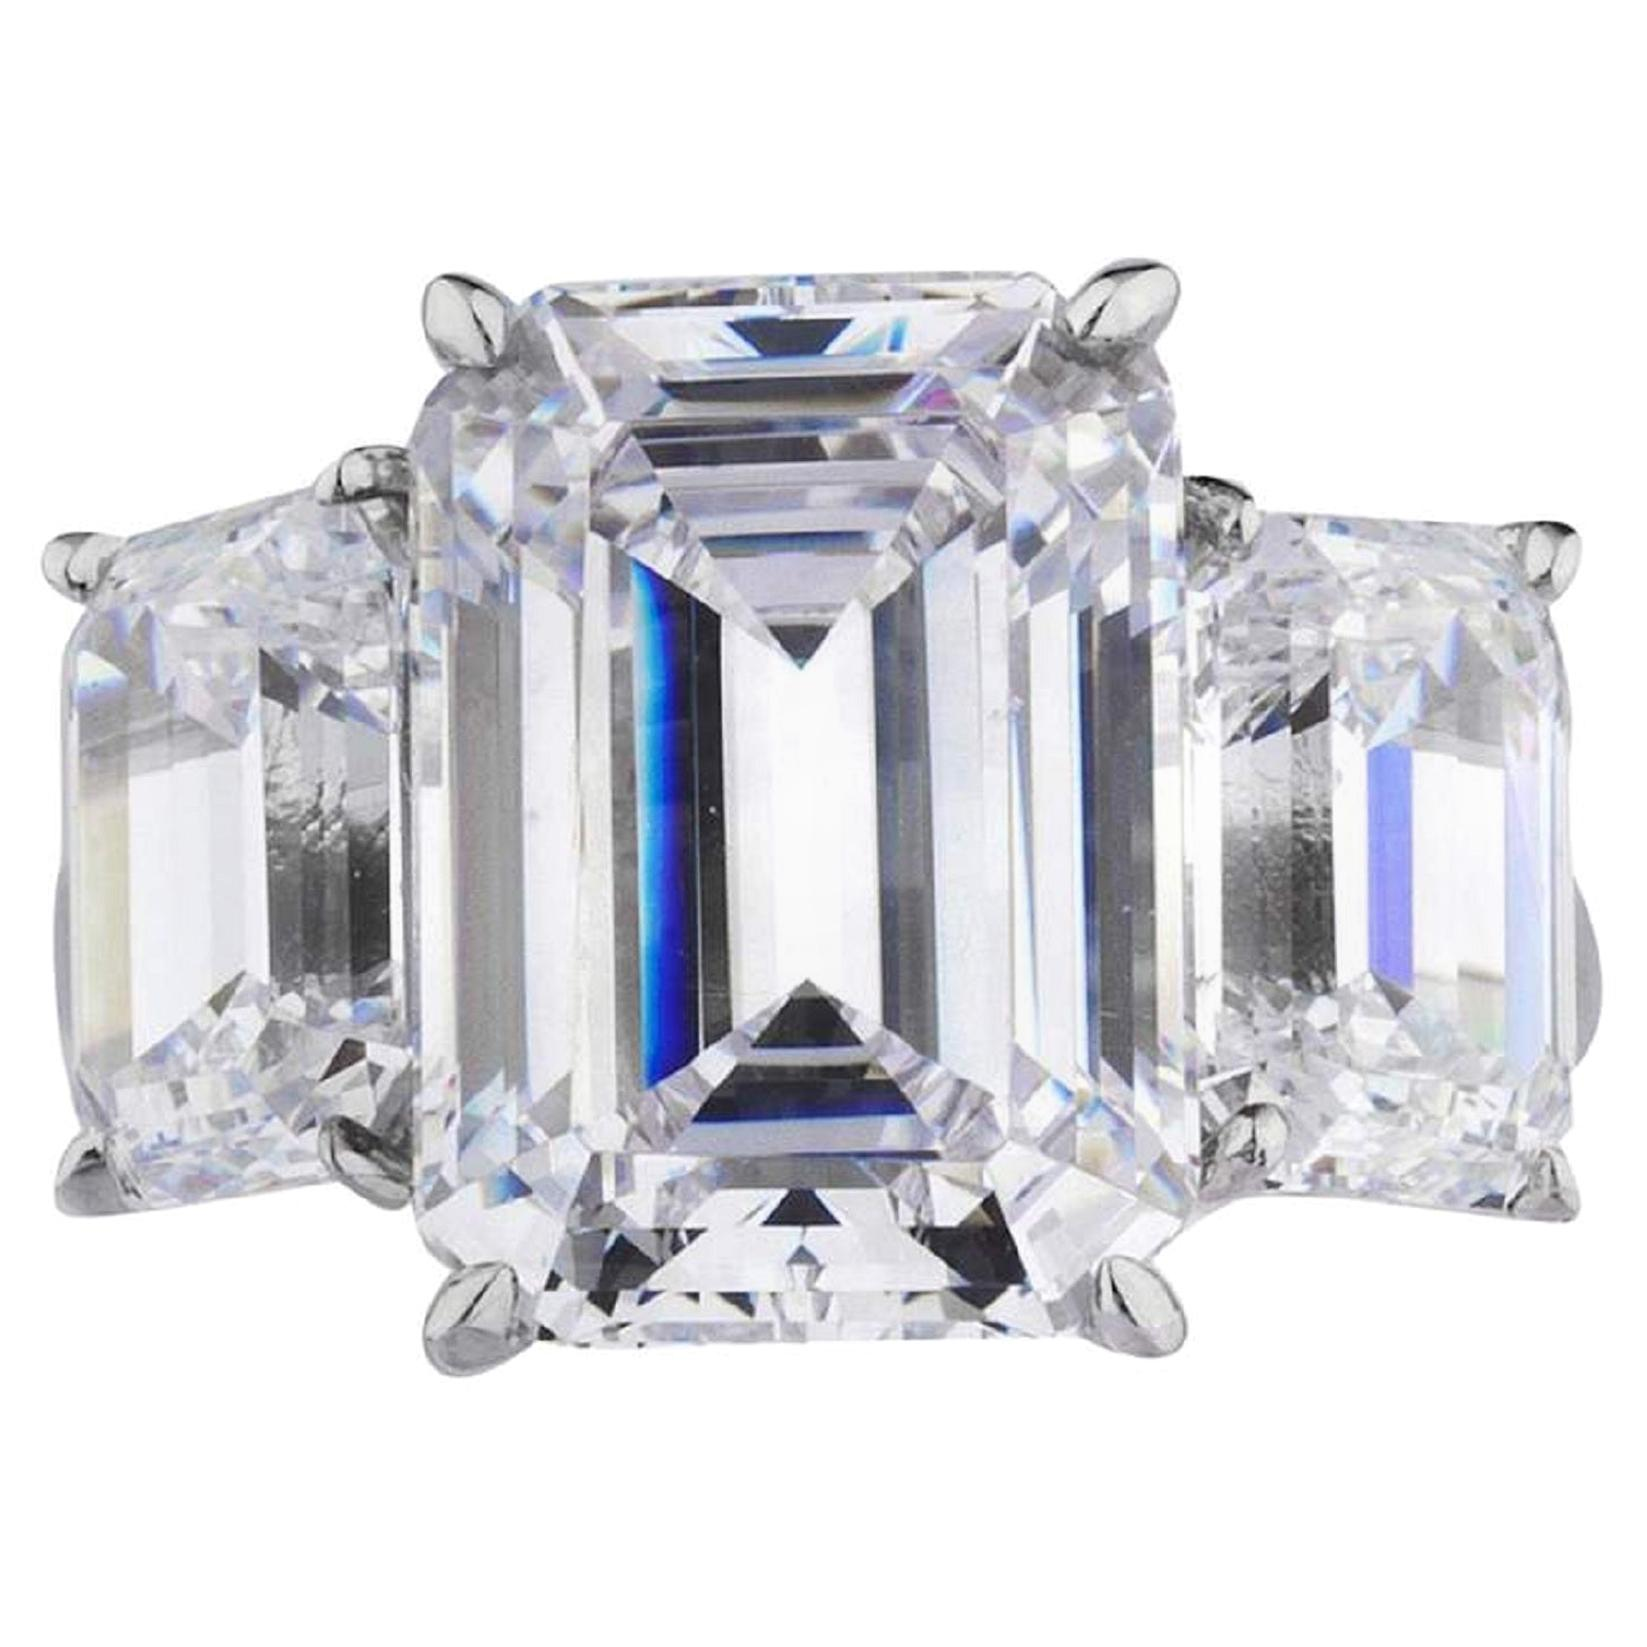 HRD GIA 6.87 Carat Three-Stone Emerald Cut Diamond Engagement Ring